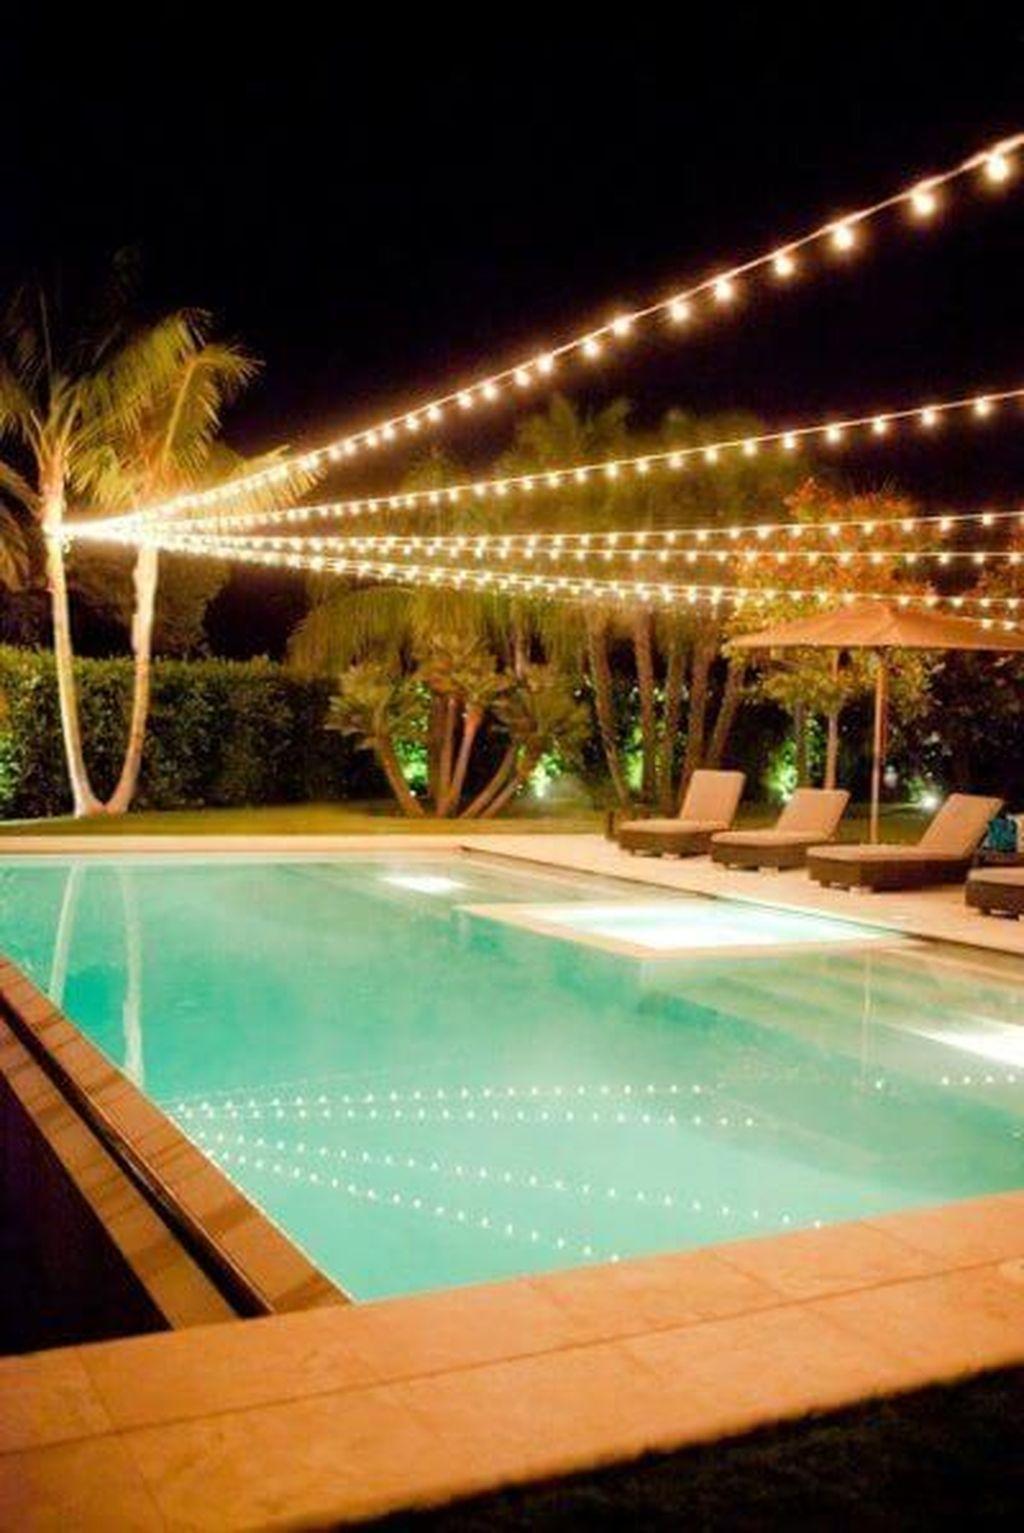 Popular Backyard Lighting Ideas Makes It Look Beautiful Pool Landscaping Backyard Pool Outdoor Pool